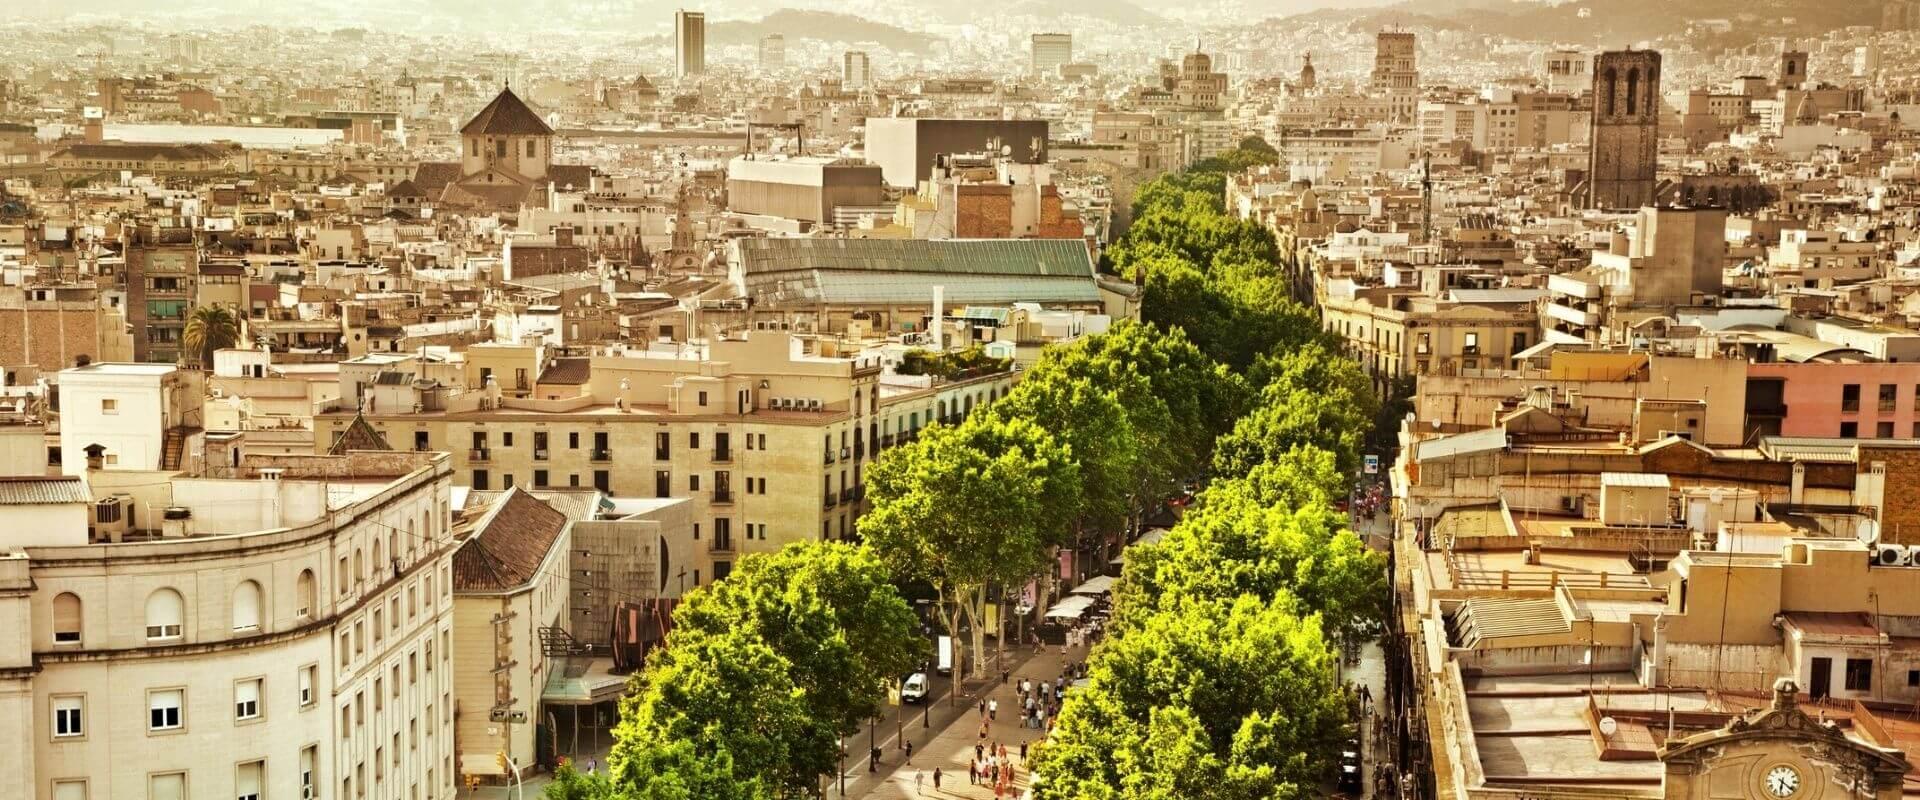 city-portraits-smart-city-barcelona.jpg